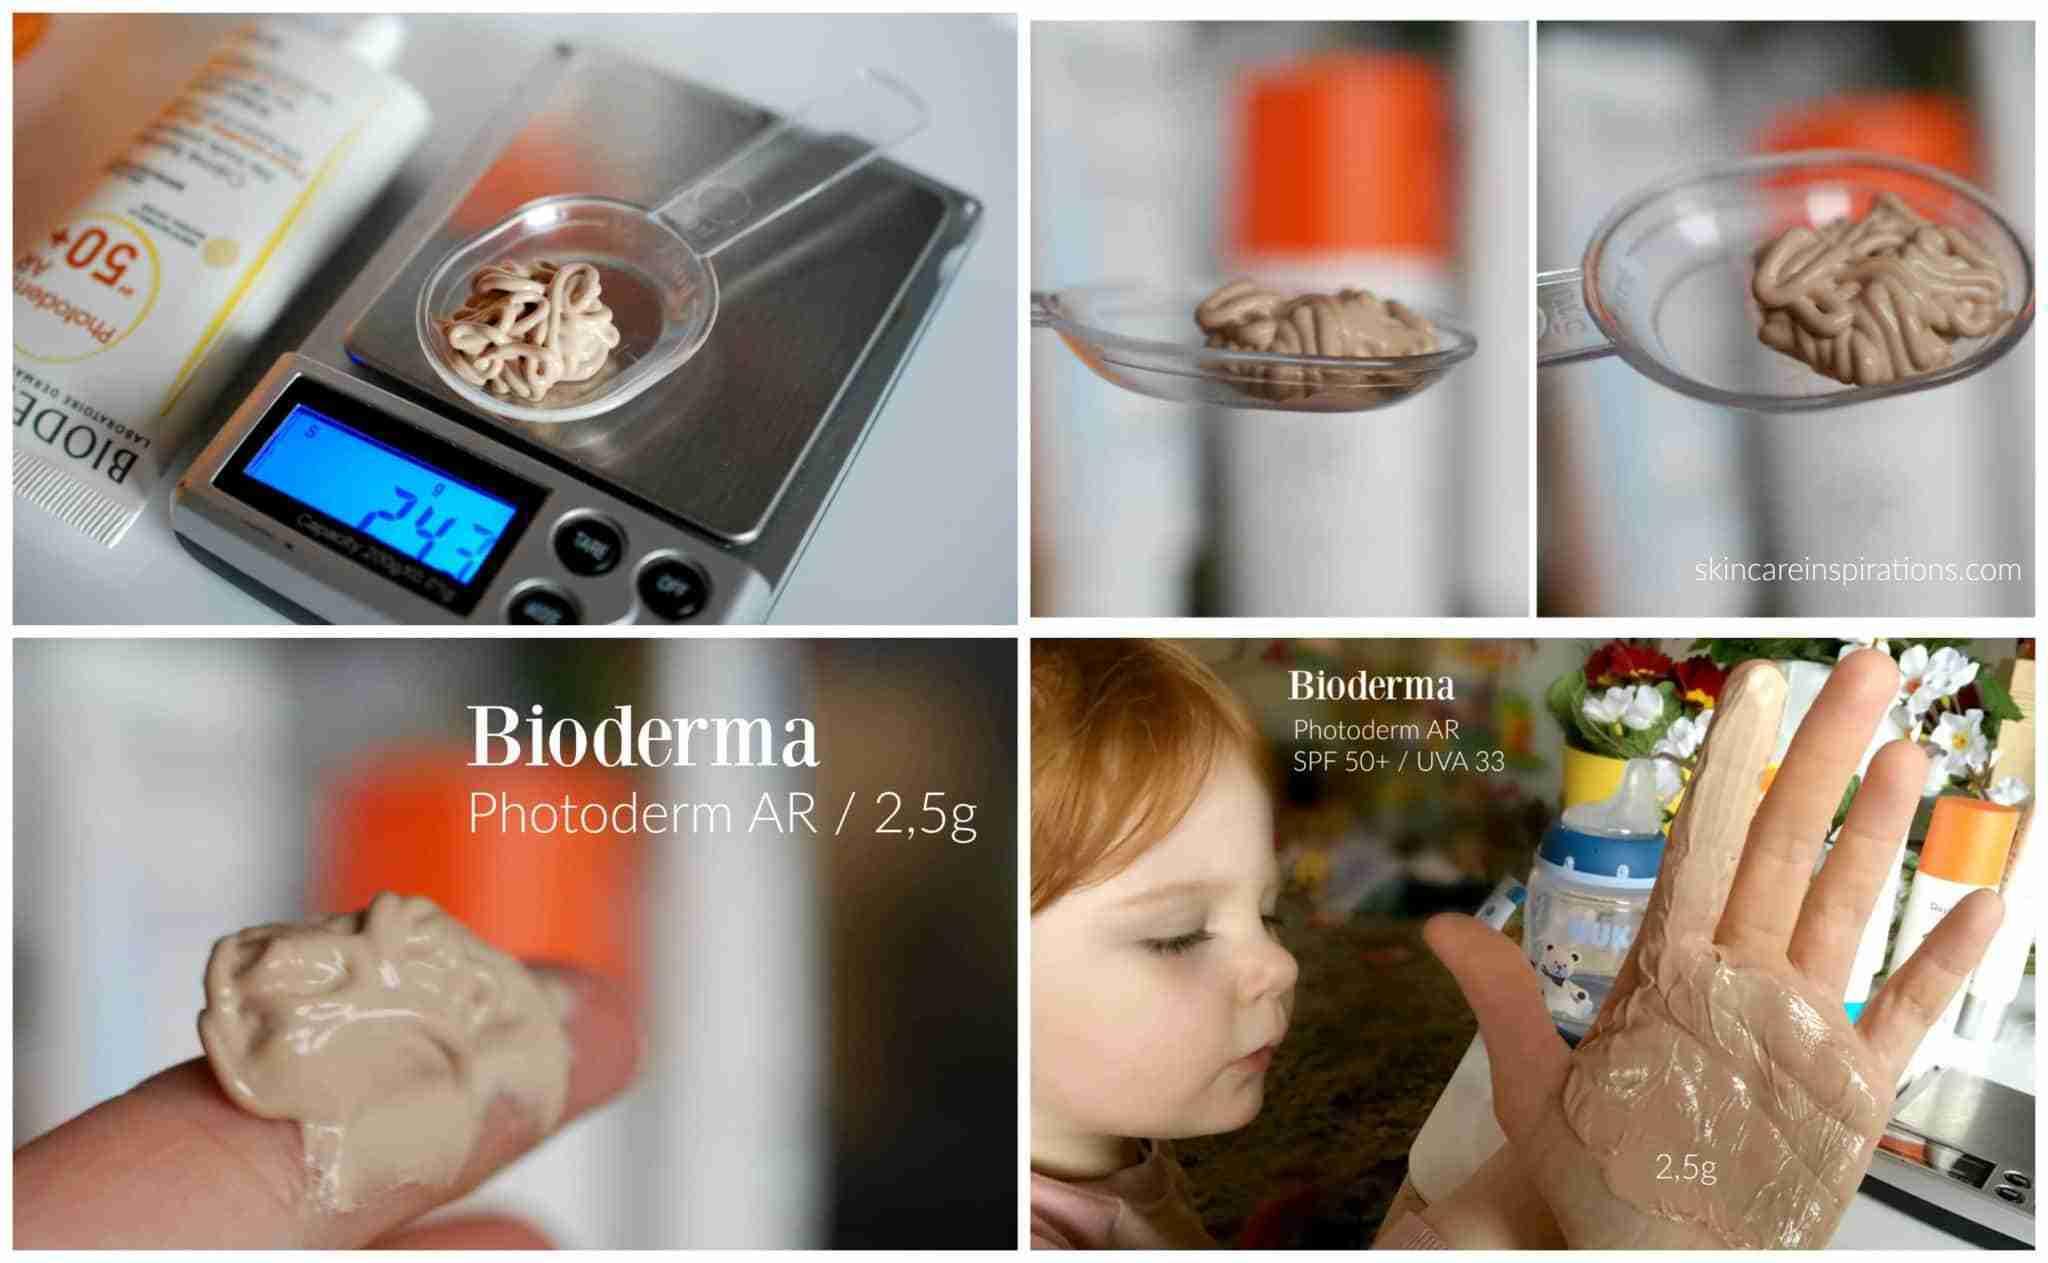 Bioderma AR Photoderm Swtaches 2,5g